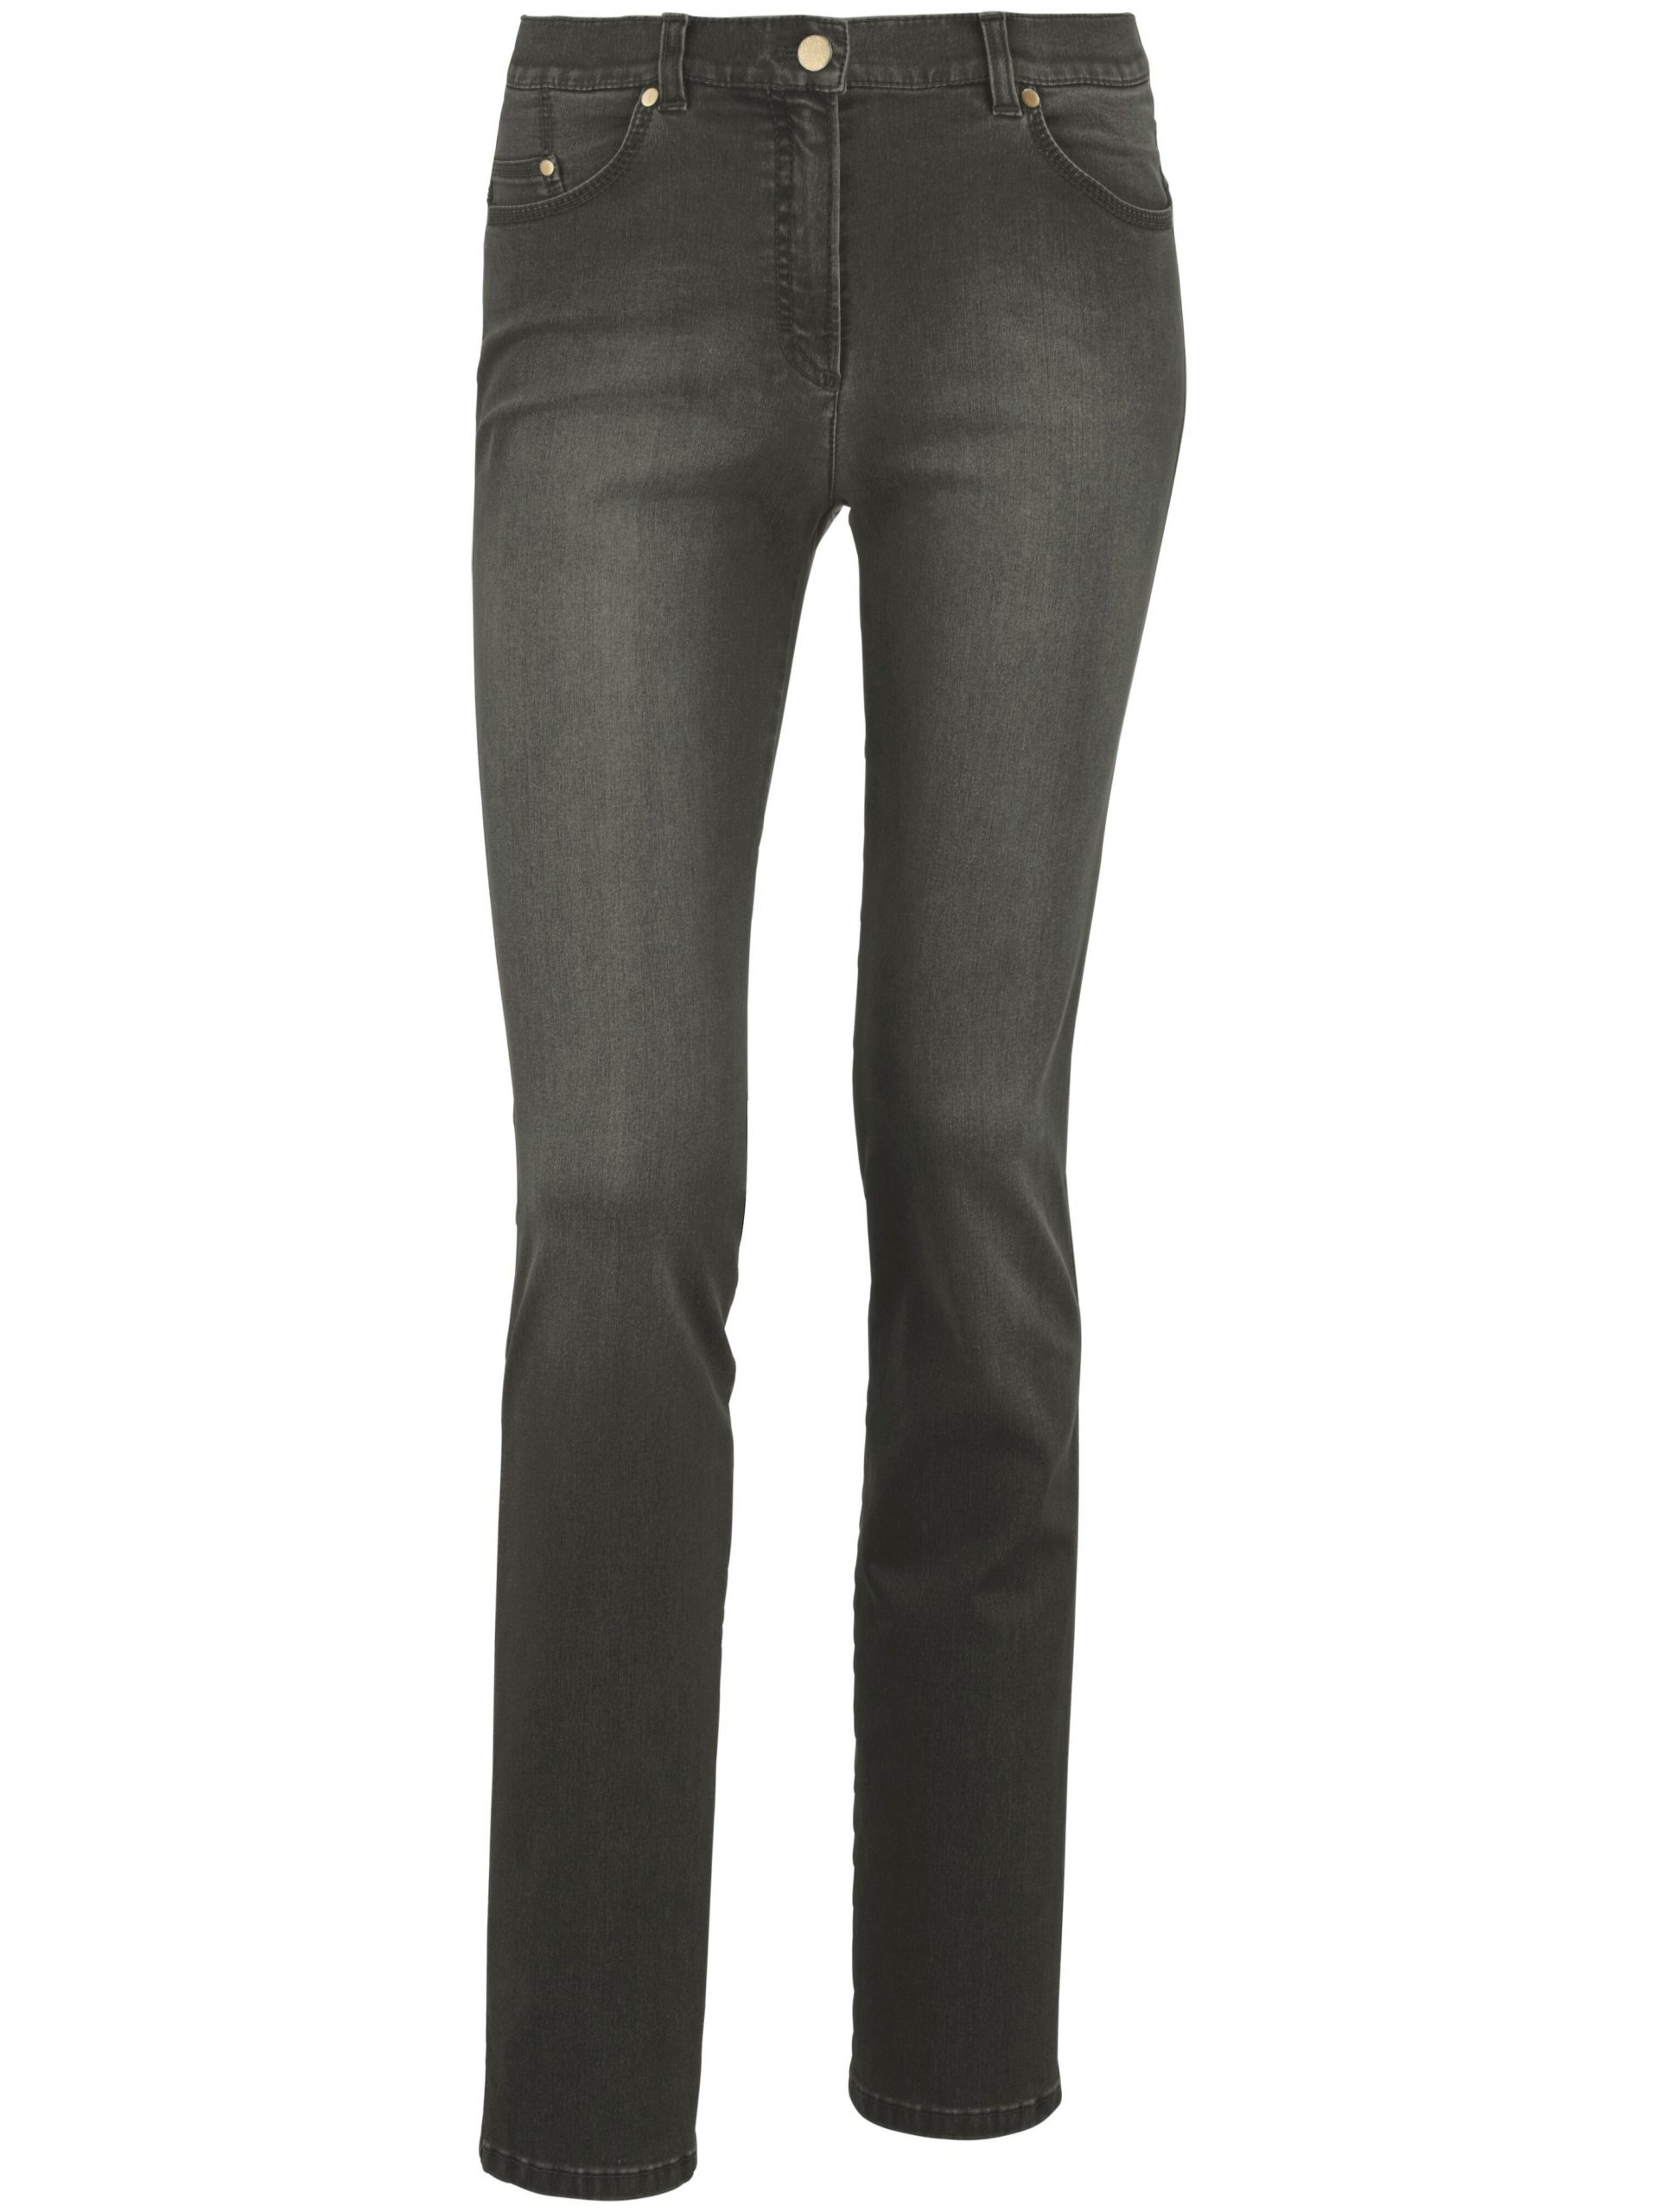 Modellerende Proform S Super Slim-jeans model Lea Van Raphaela by Brax denim Kopen